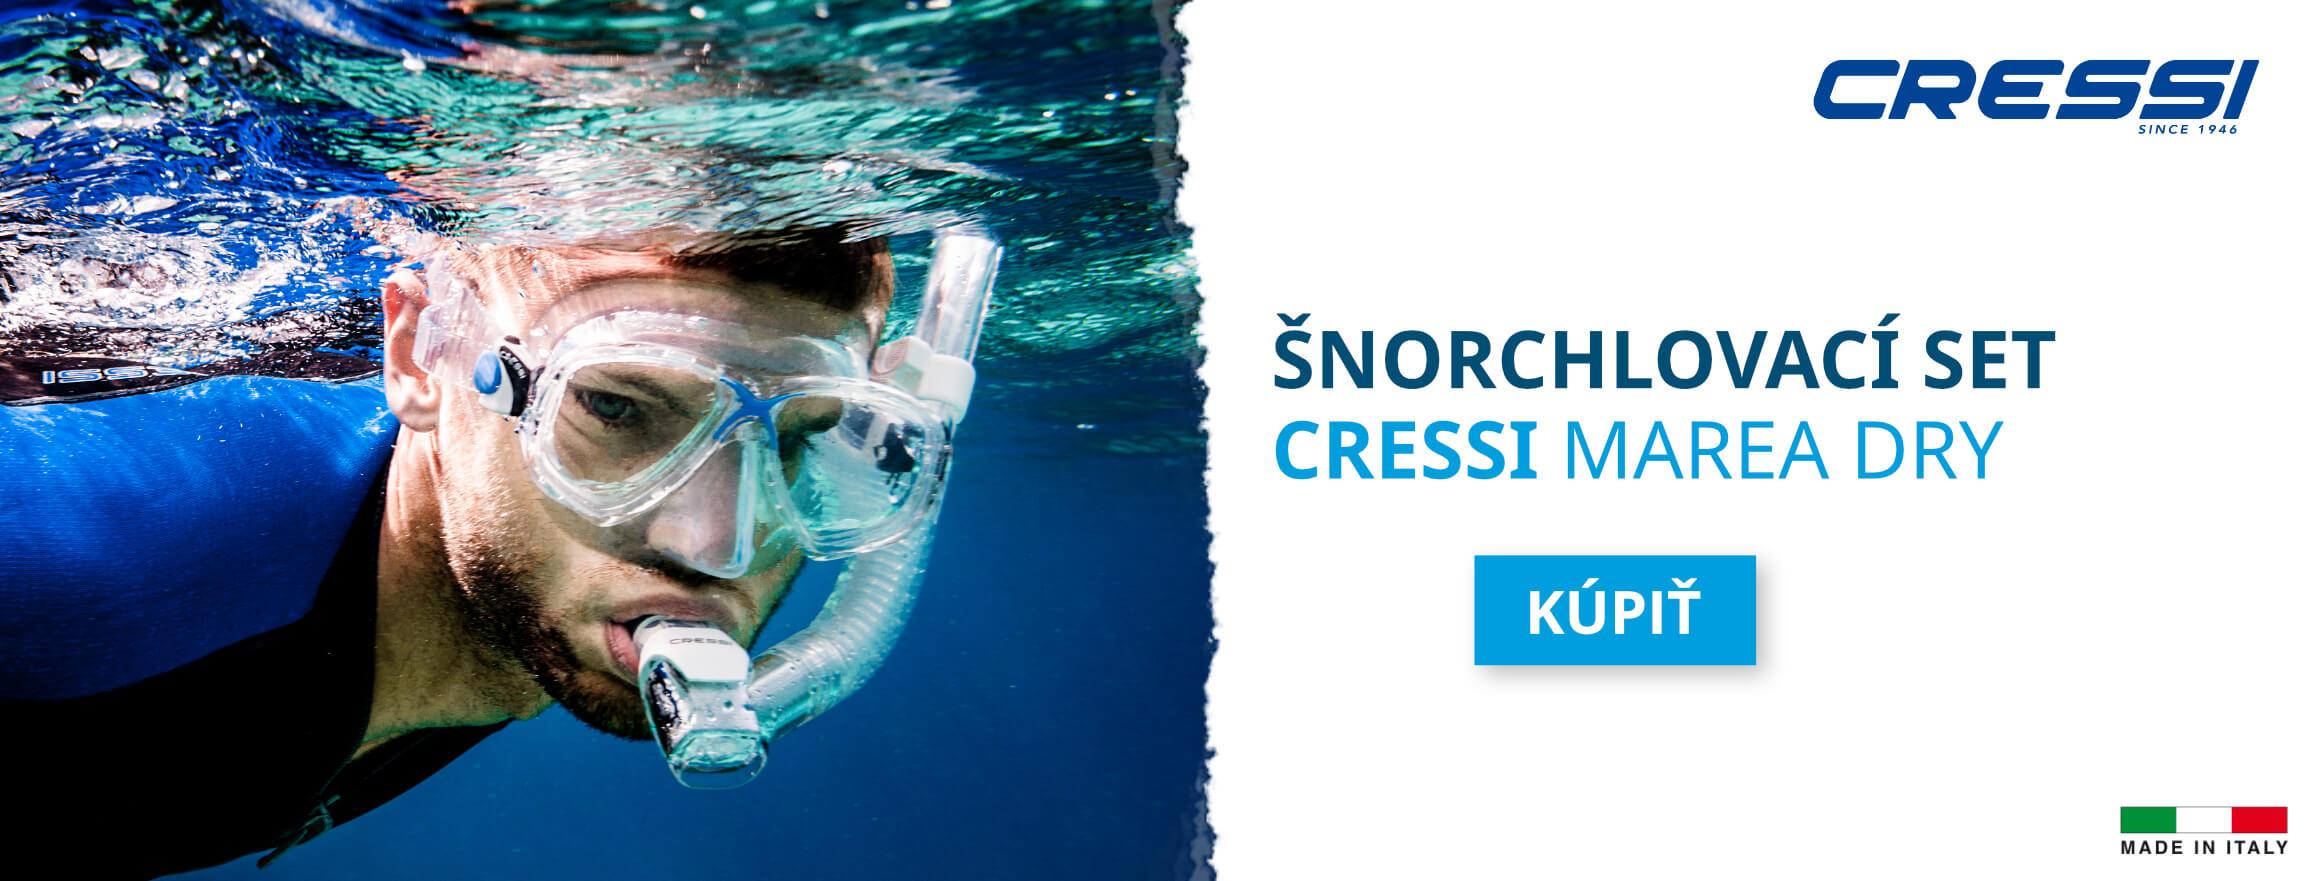 Šnorchlovacie sety Cressi